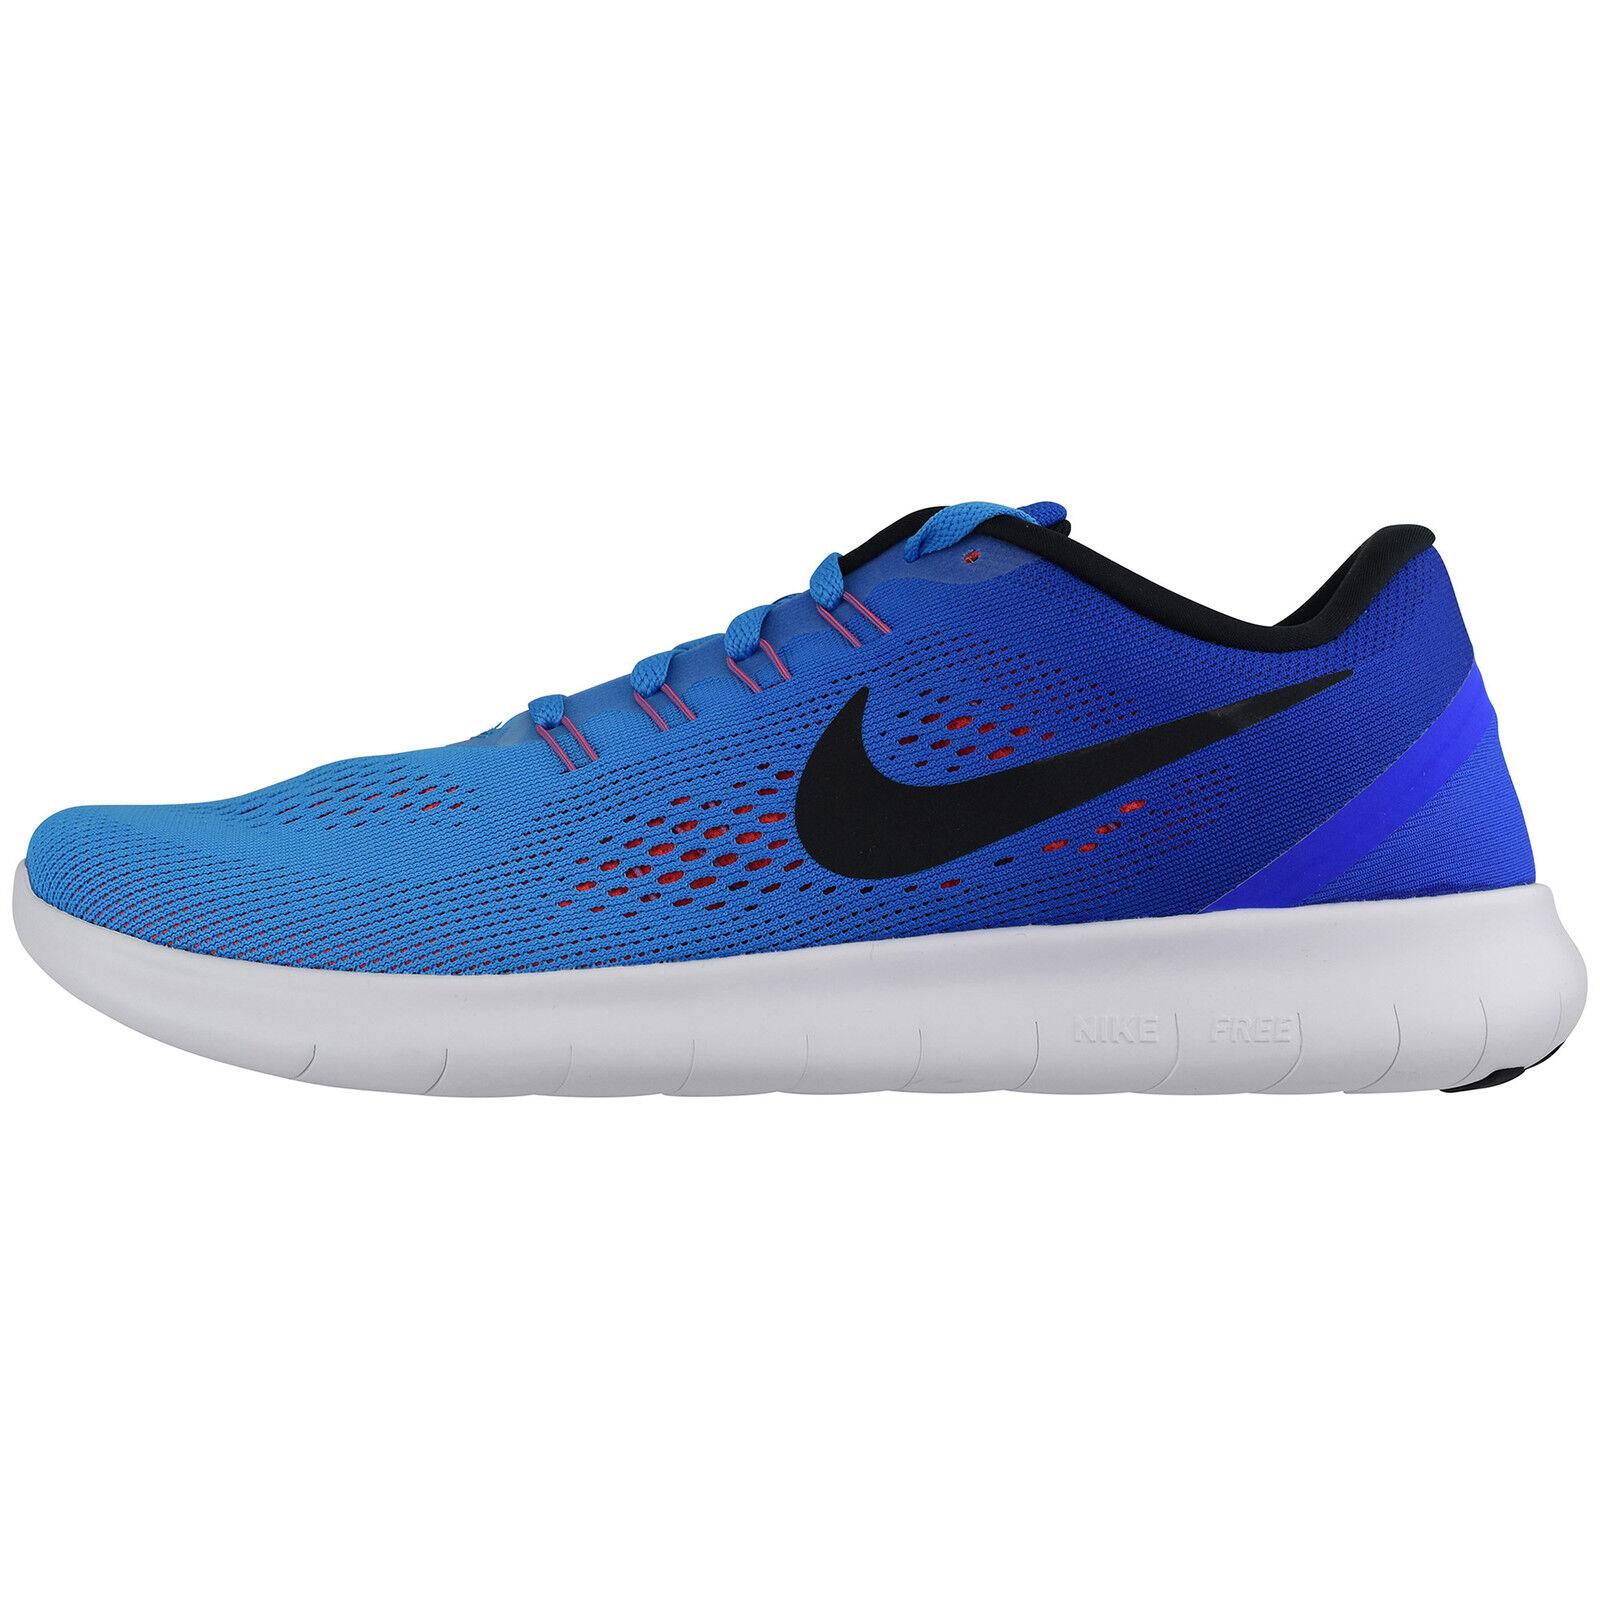 WMNS Lifestyle Nike Free RN 831509-404 Lifestyle WMNS Laufschuhe Running Freizeit Sneaker 4c33d0